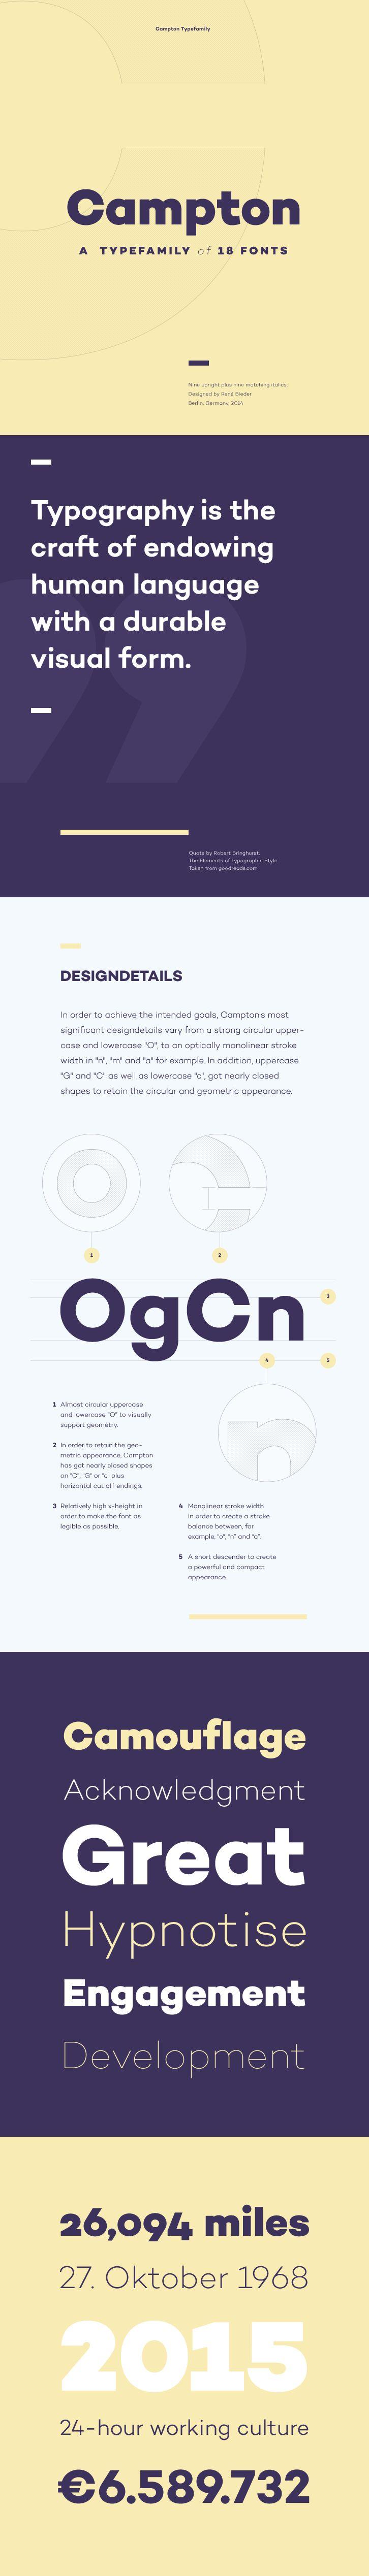 Campton free font - Fontfabric